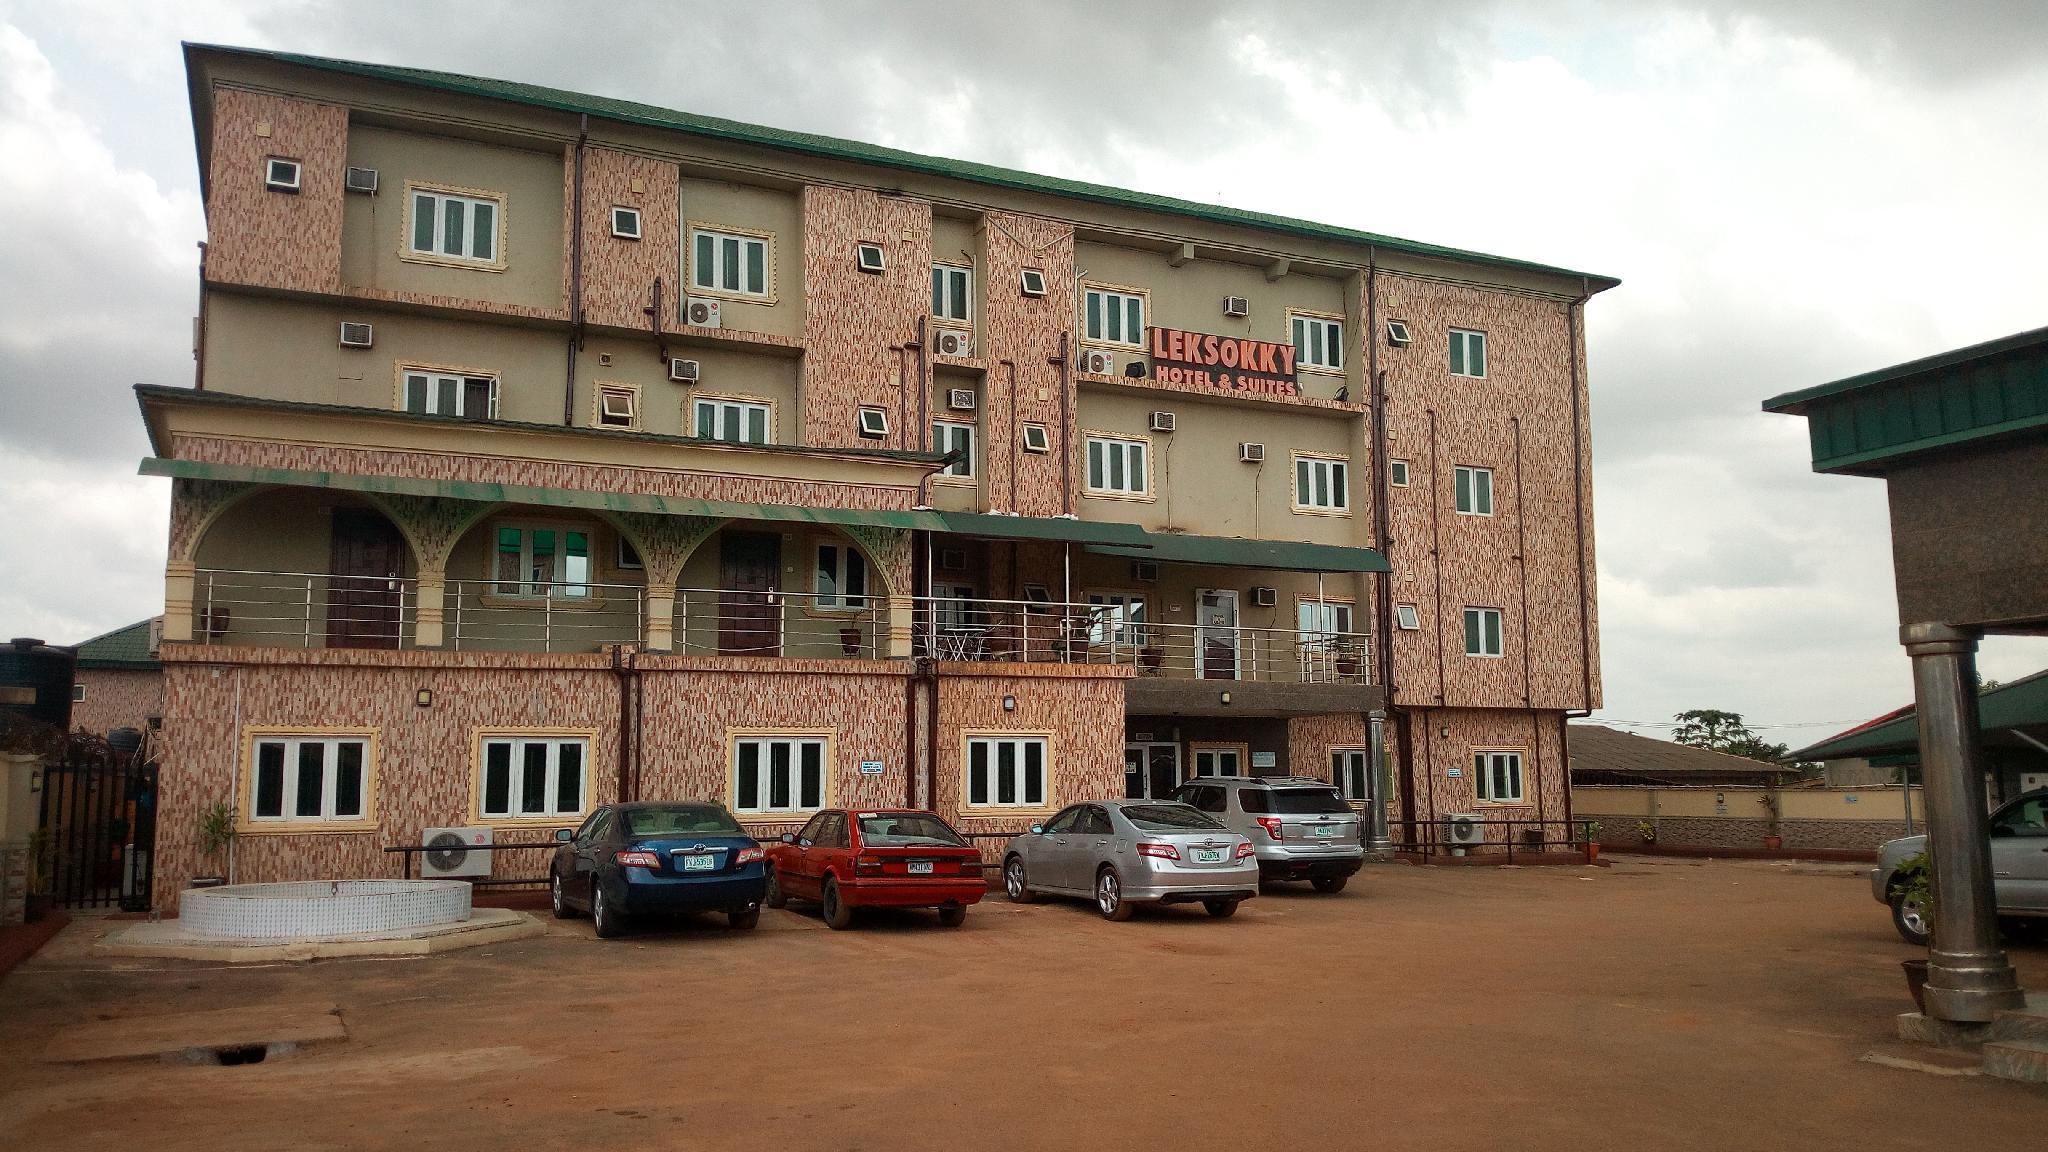 Leksokky Hotel And Suites